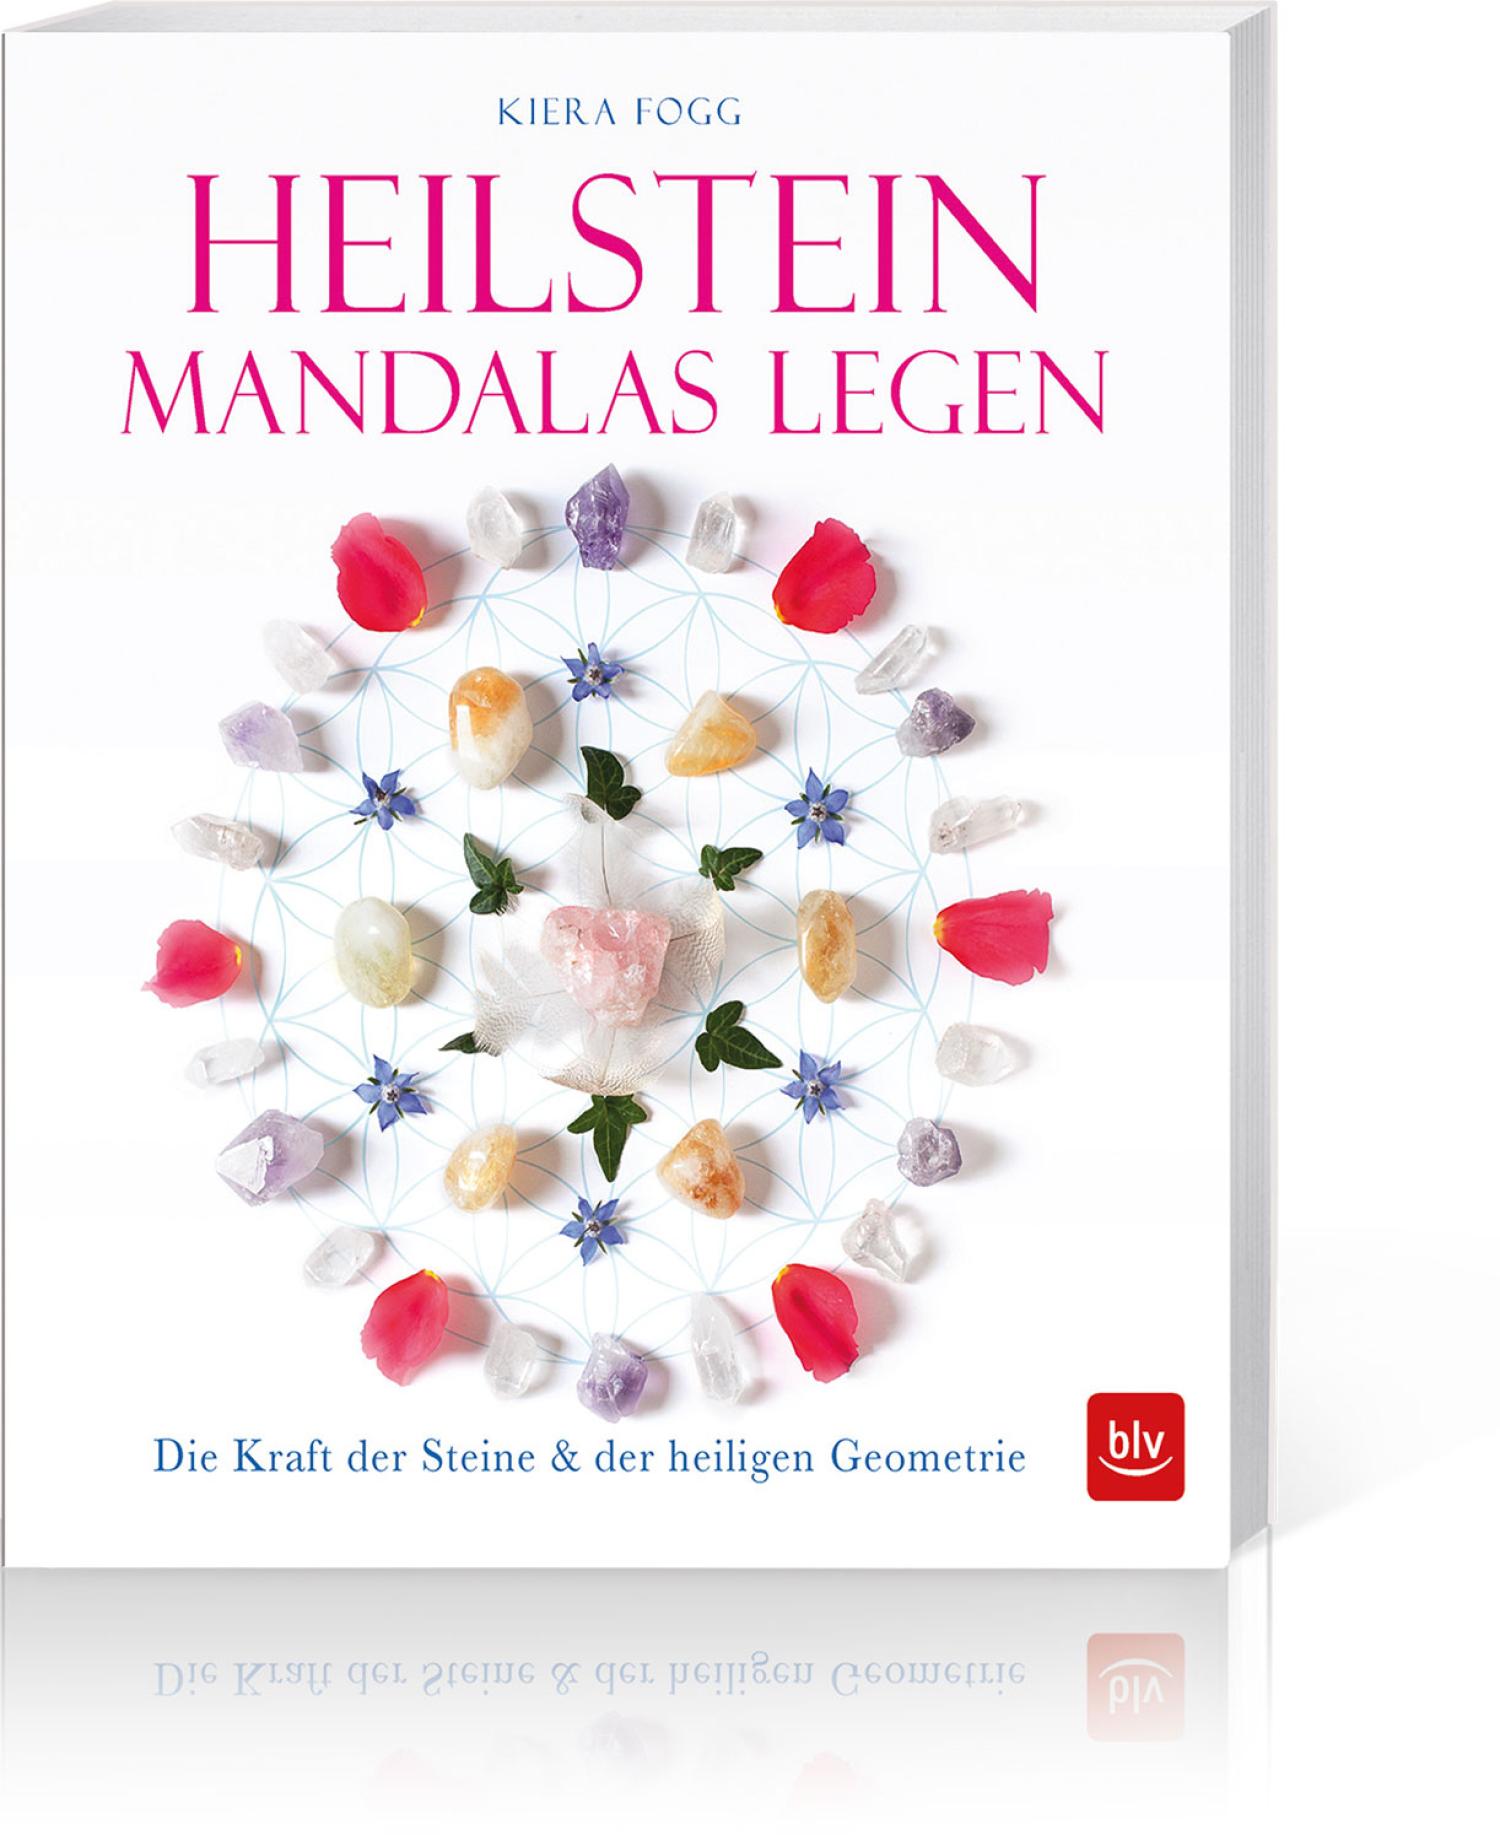 Heilstein-Mandalas legen, Produktbild 1